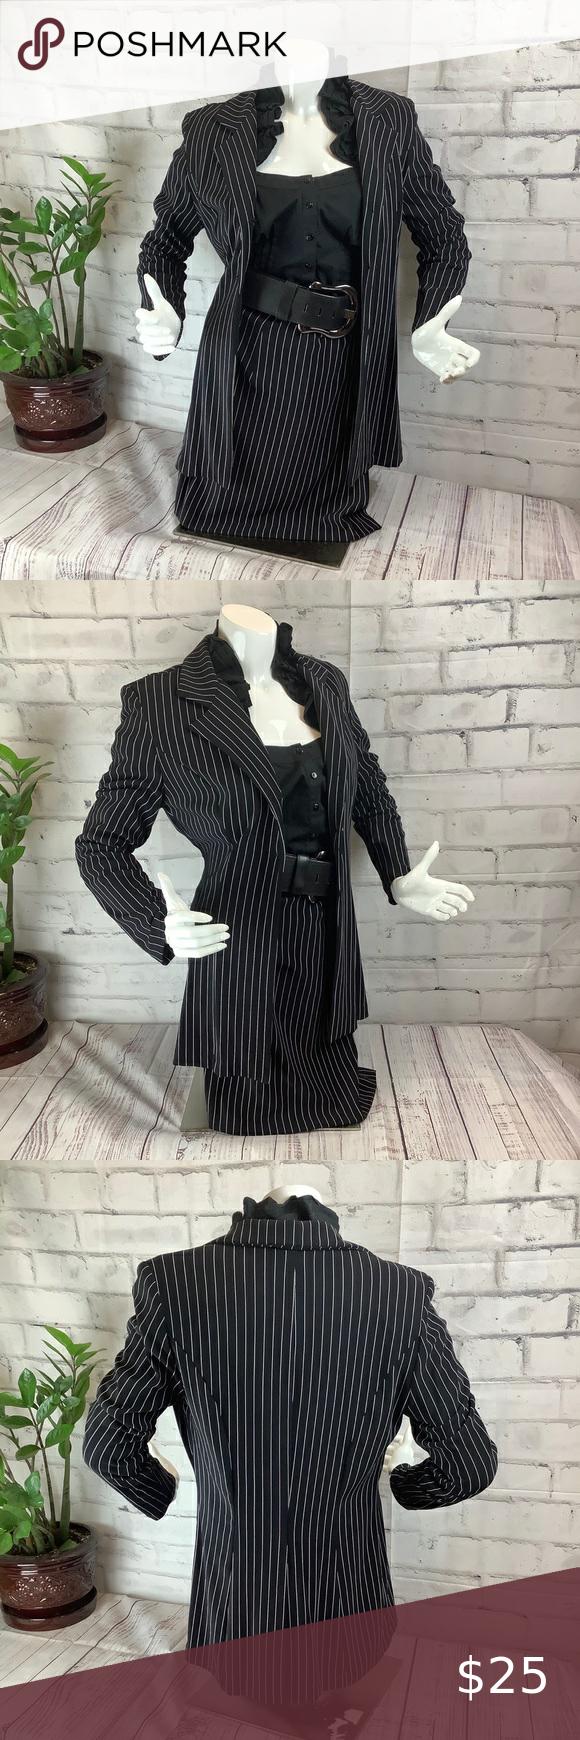 I just added this listing on Poshmark: Breaking Loose Striped suit size 9/10, Black. #shopmycloset #poshmark #fashion #shopping #style #forsale #Breaking Loose #Jackets & Blazers